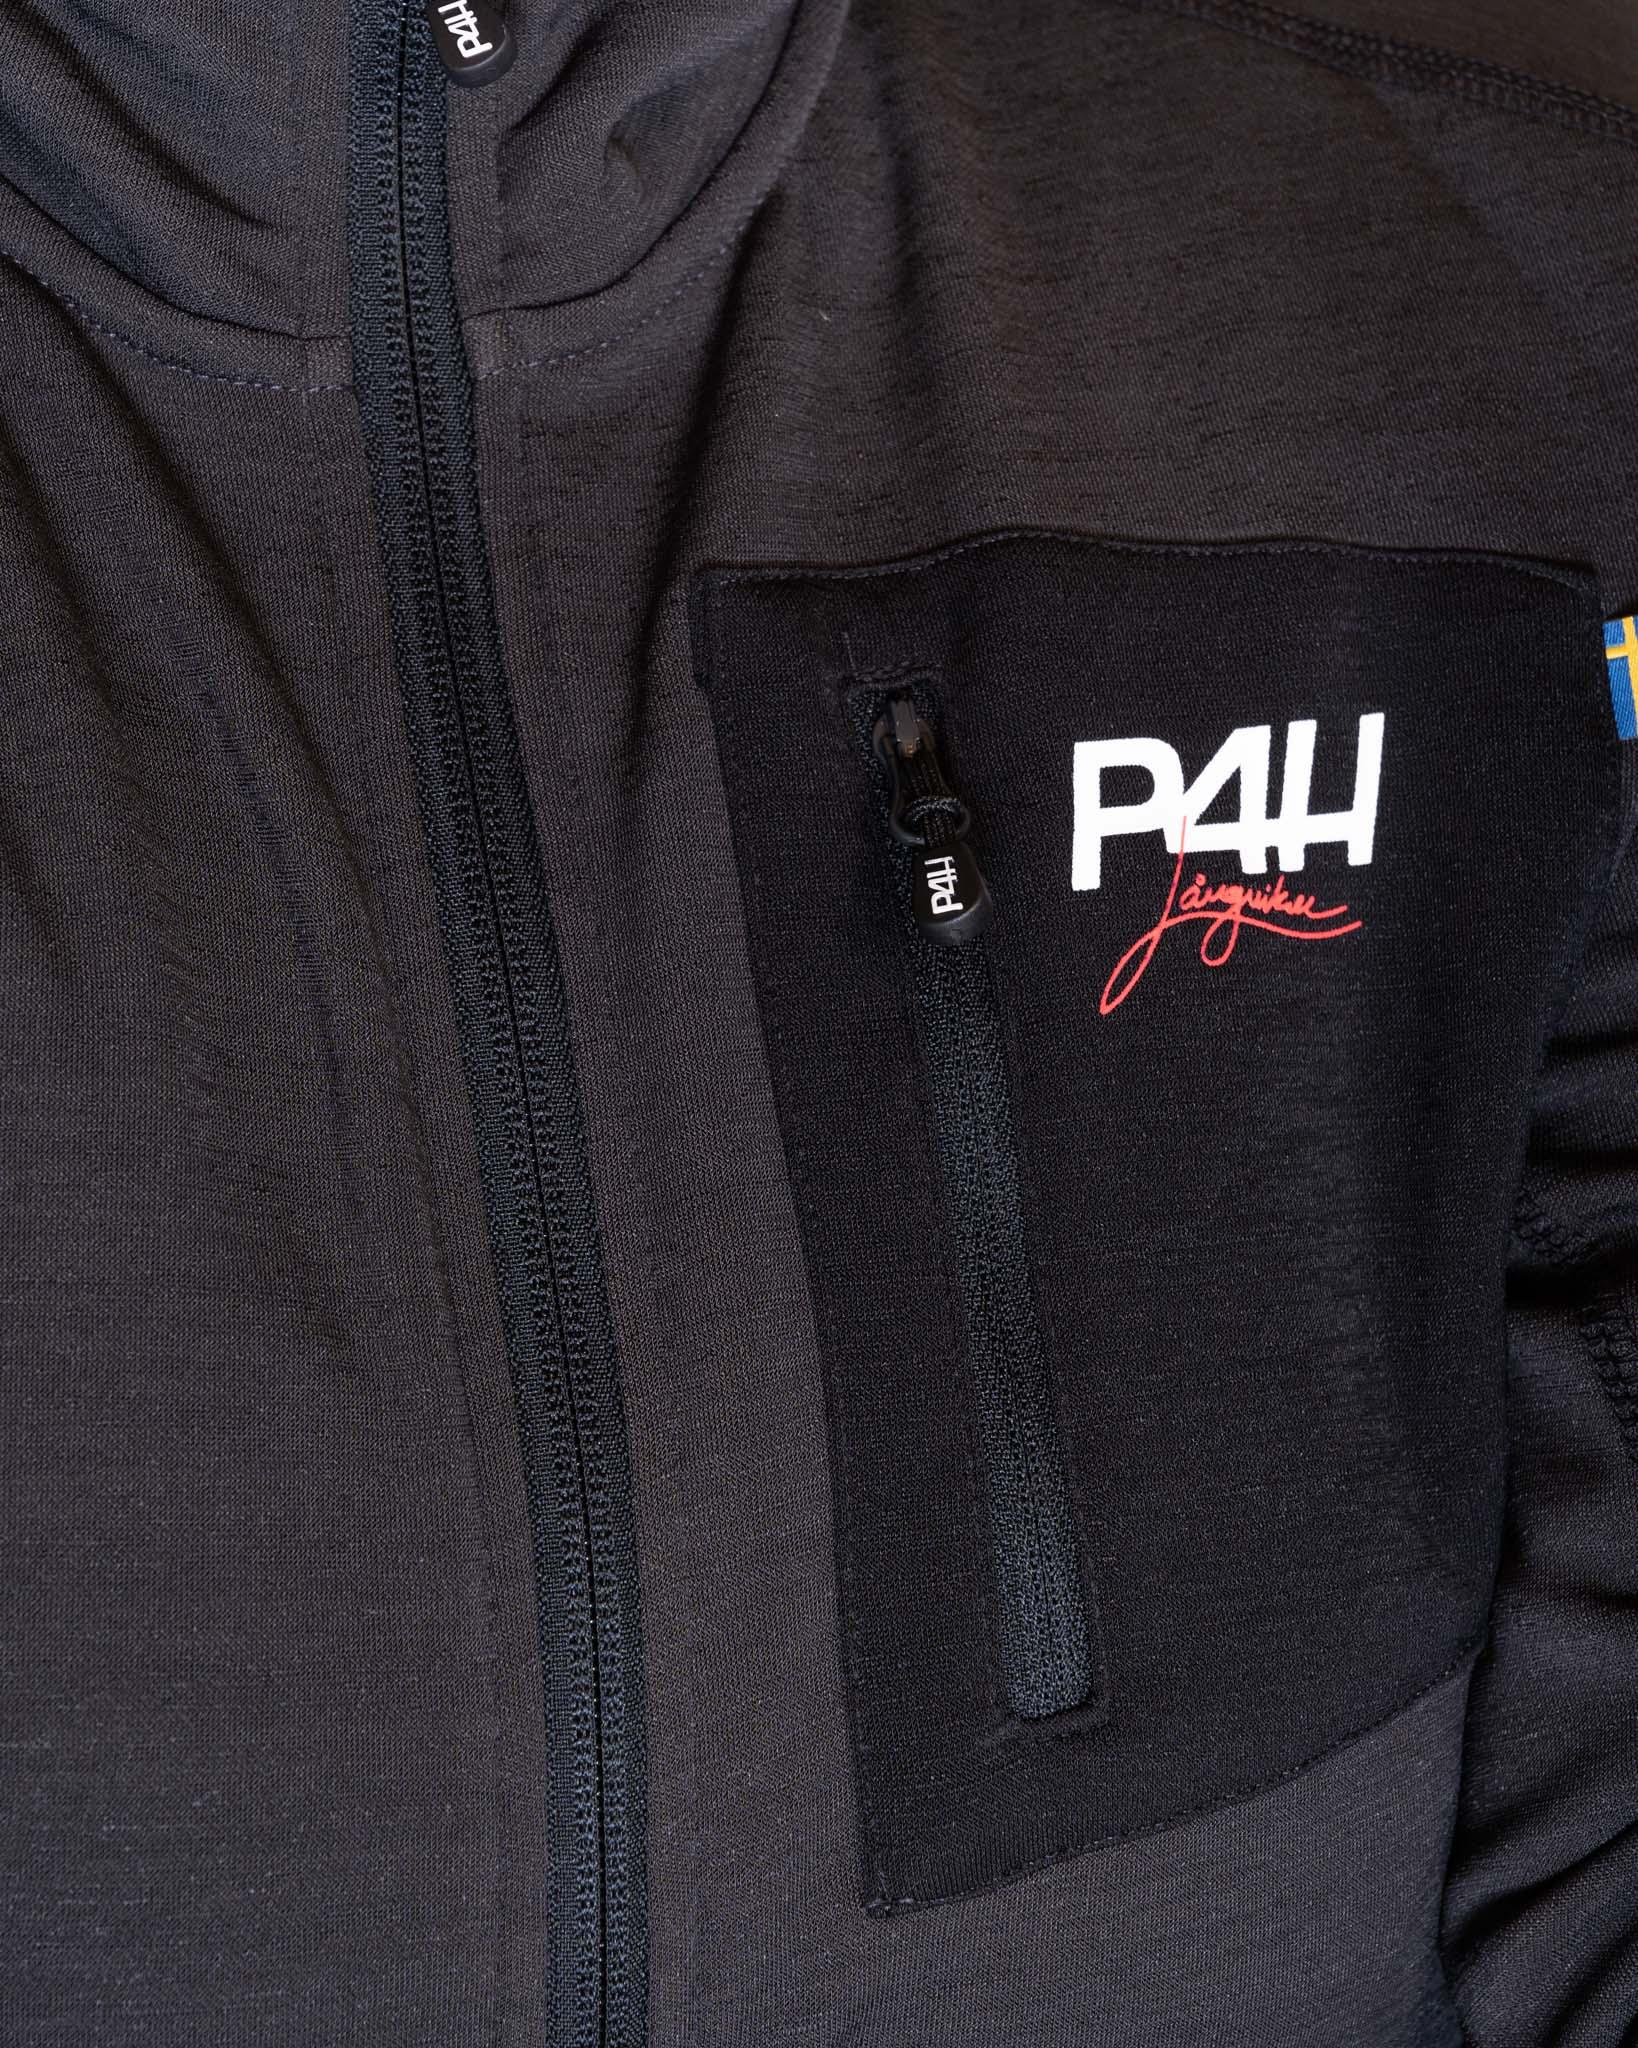 P4H Powerfleece Jacket Black Comb, Dam